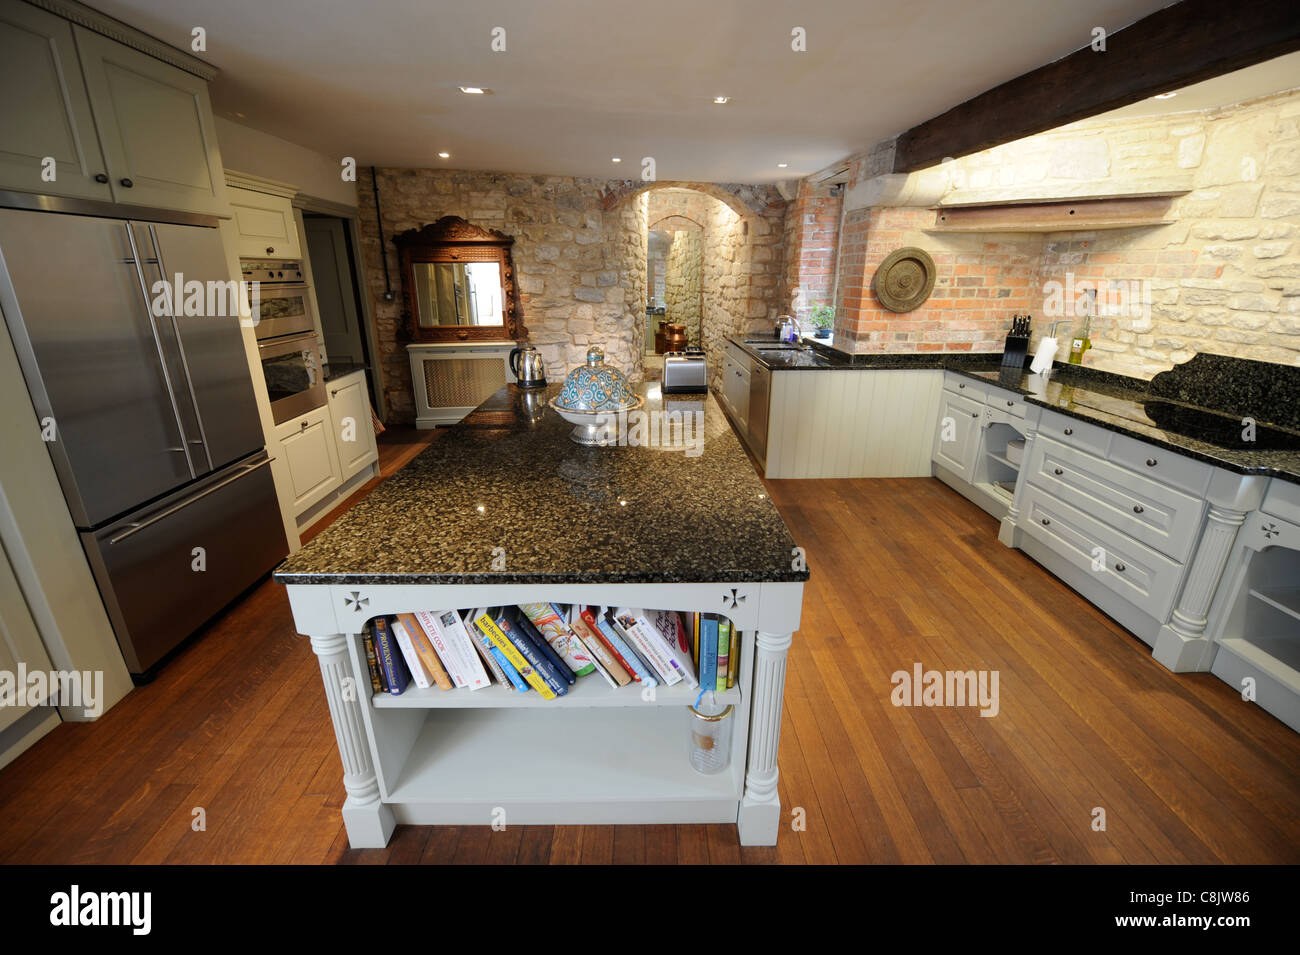 Granite Worktops Stock Photos & Granite Worktops Stock Images - Alamy